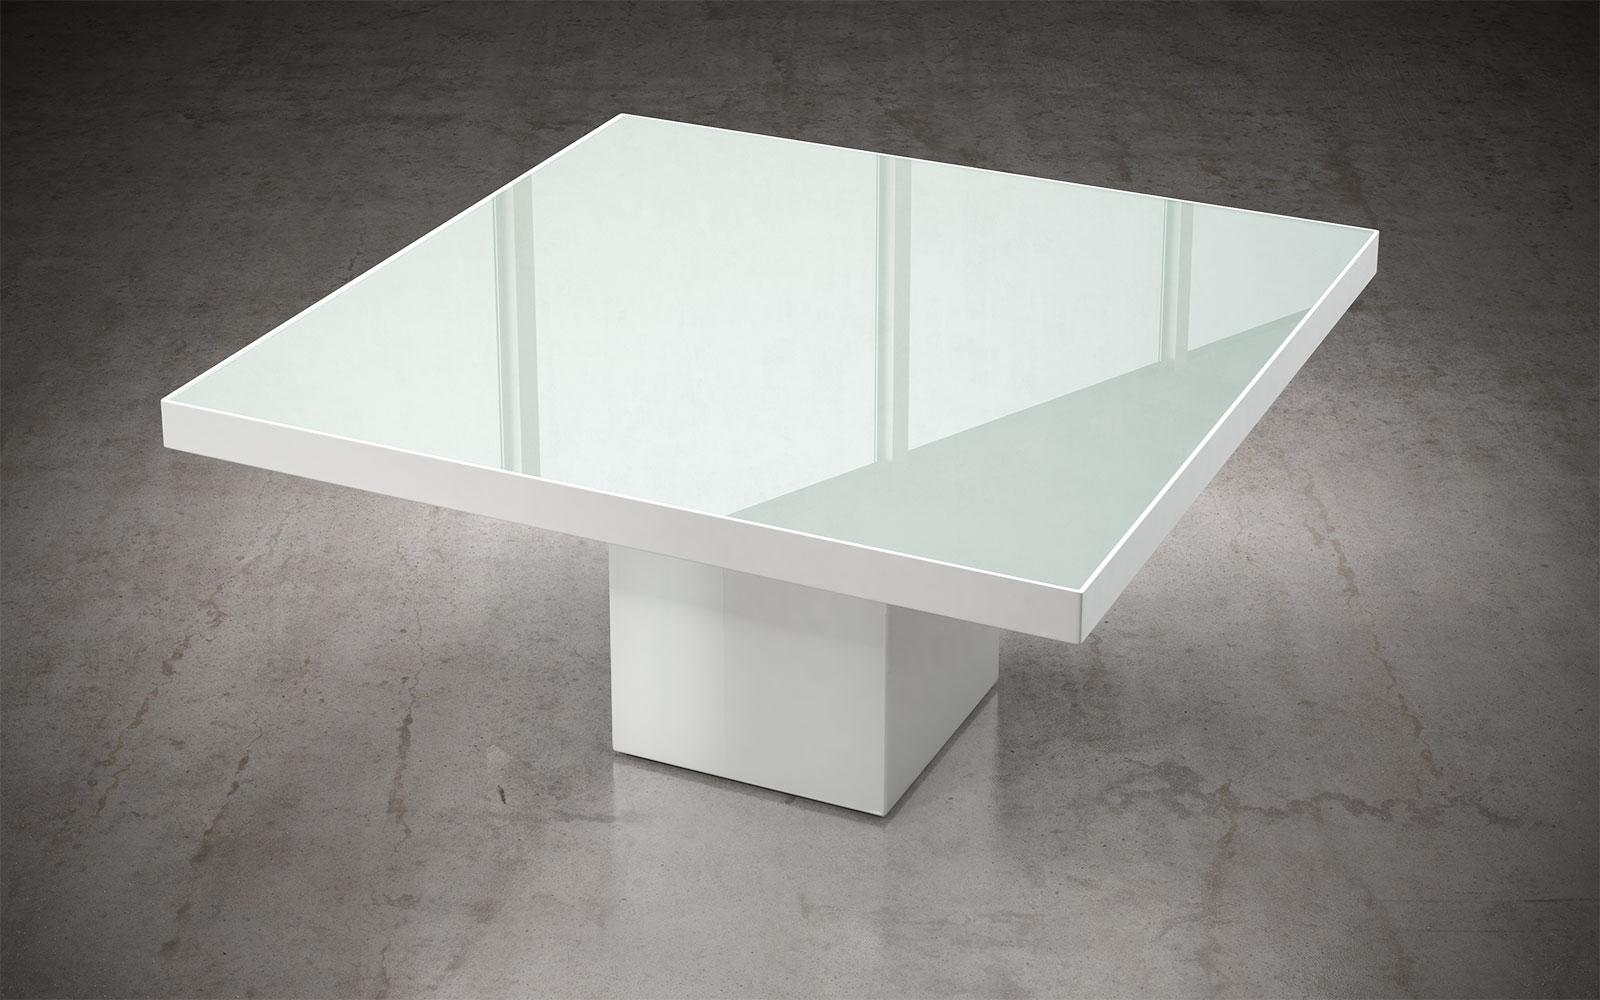 Beech Table